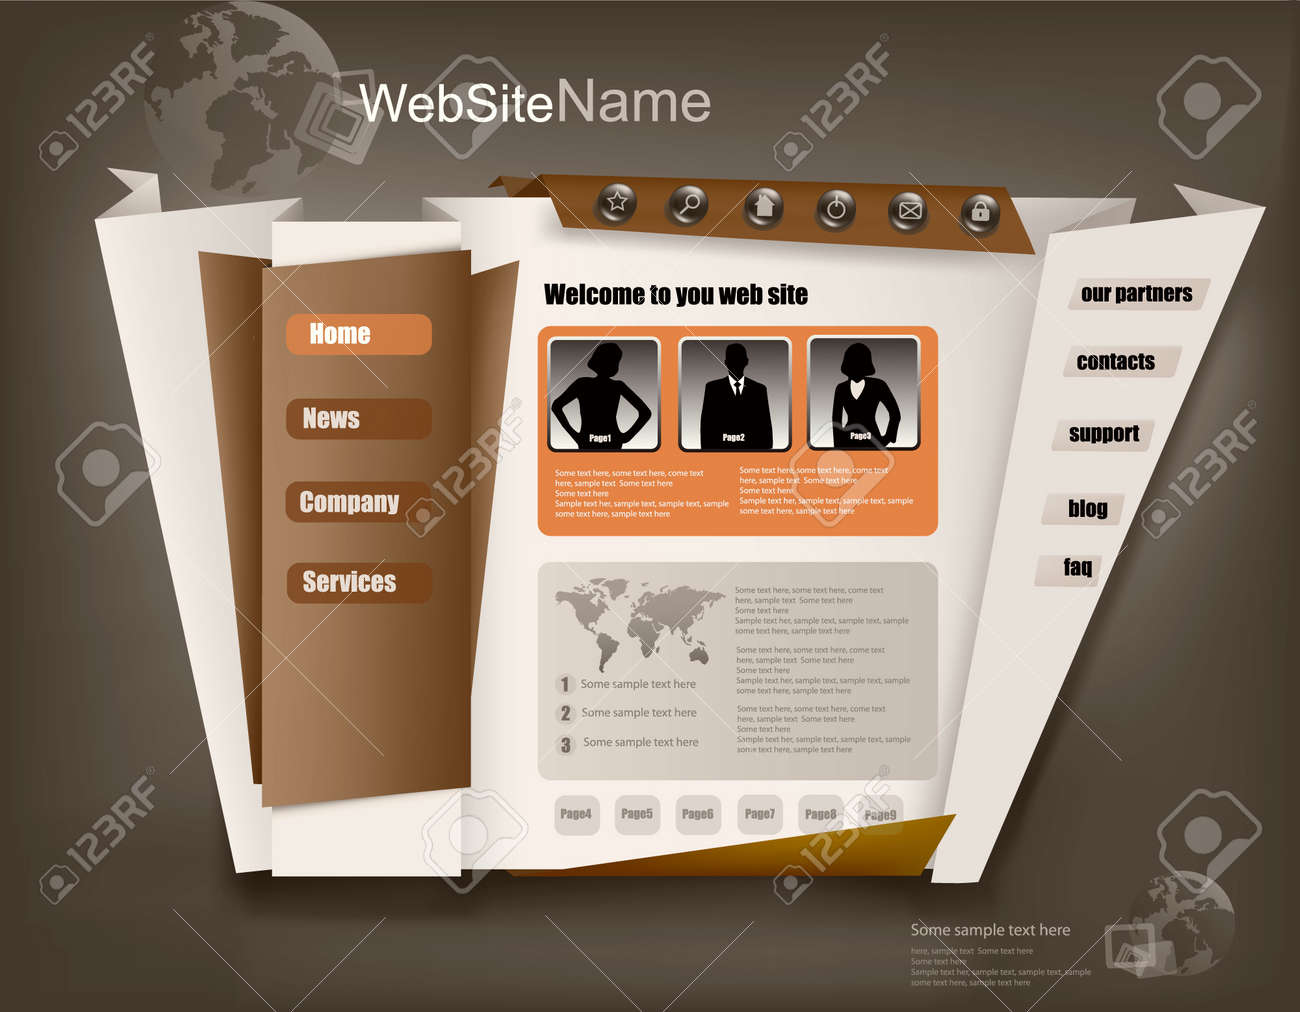 Business website design template. Vector illustration. Stock Vector - 10066694